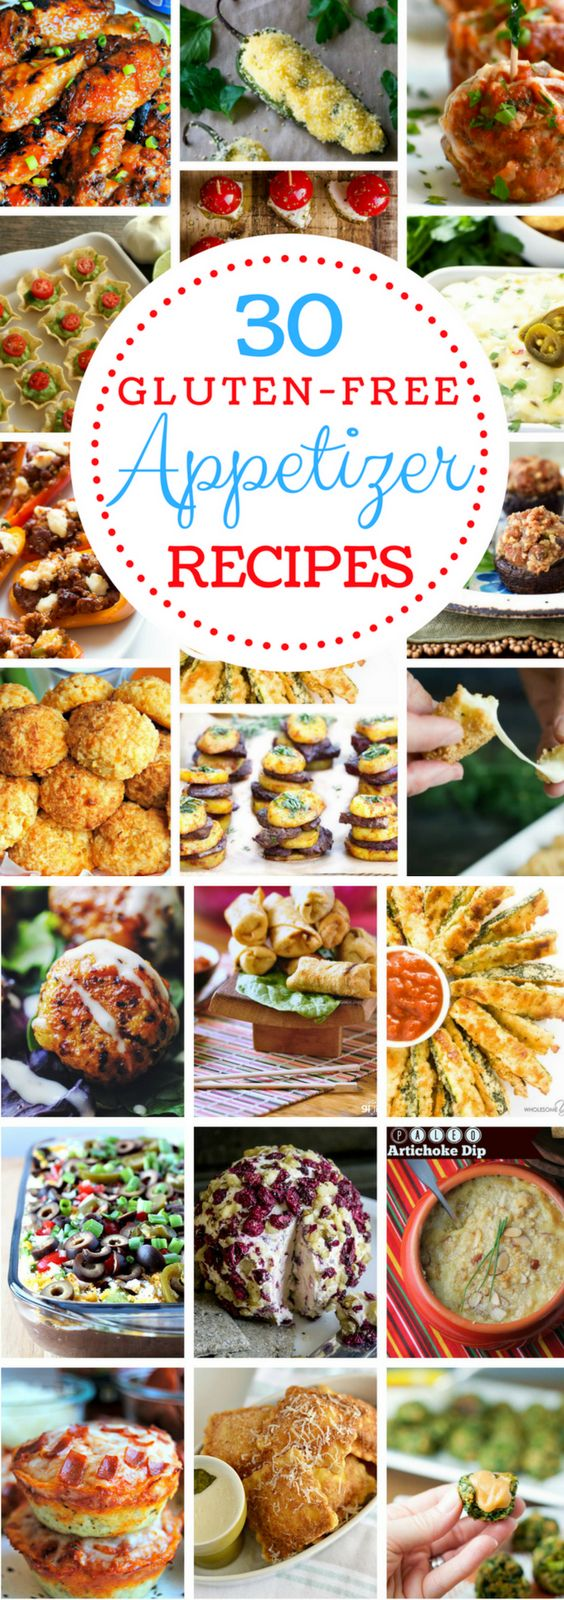 30 Gluten-Free Appetizer Recipes #glutenfree #appetizers #partyfood